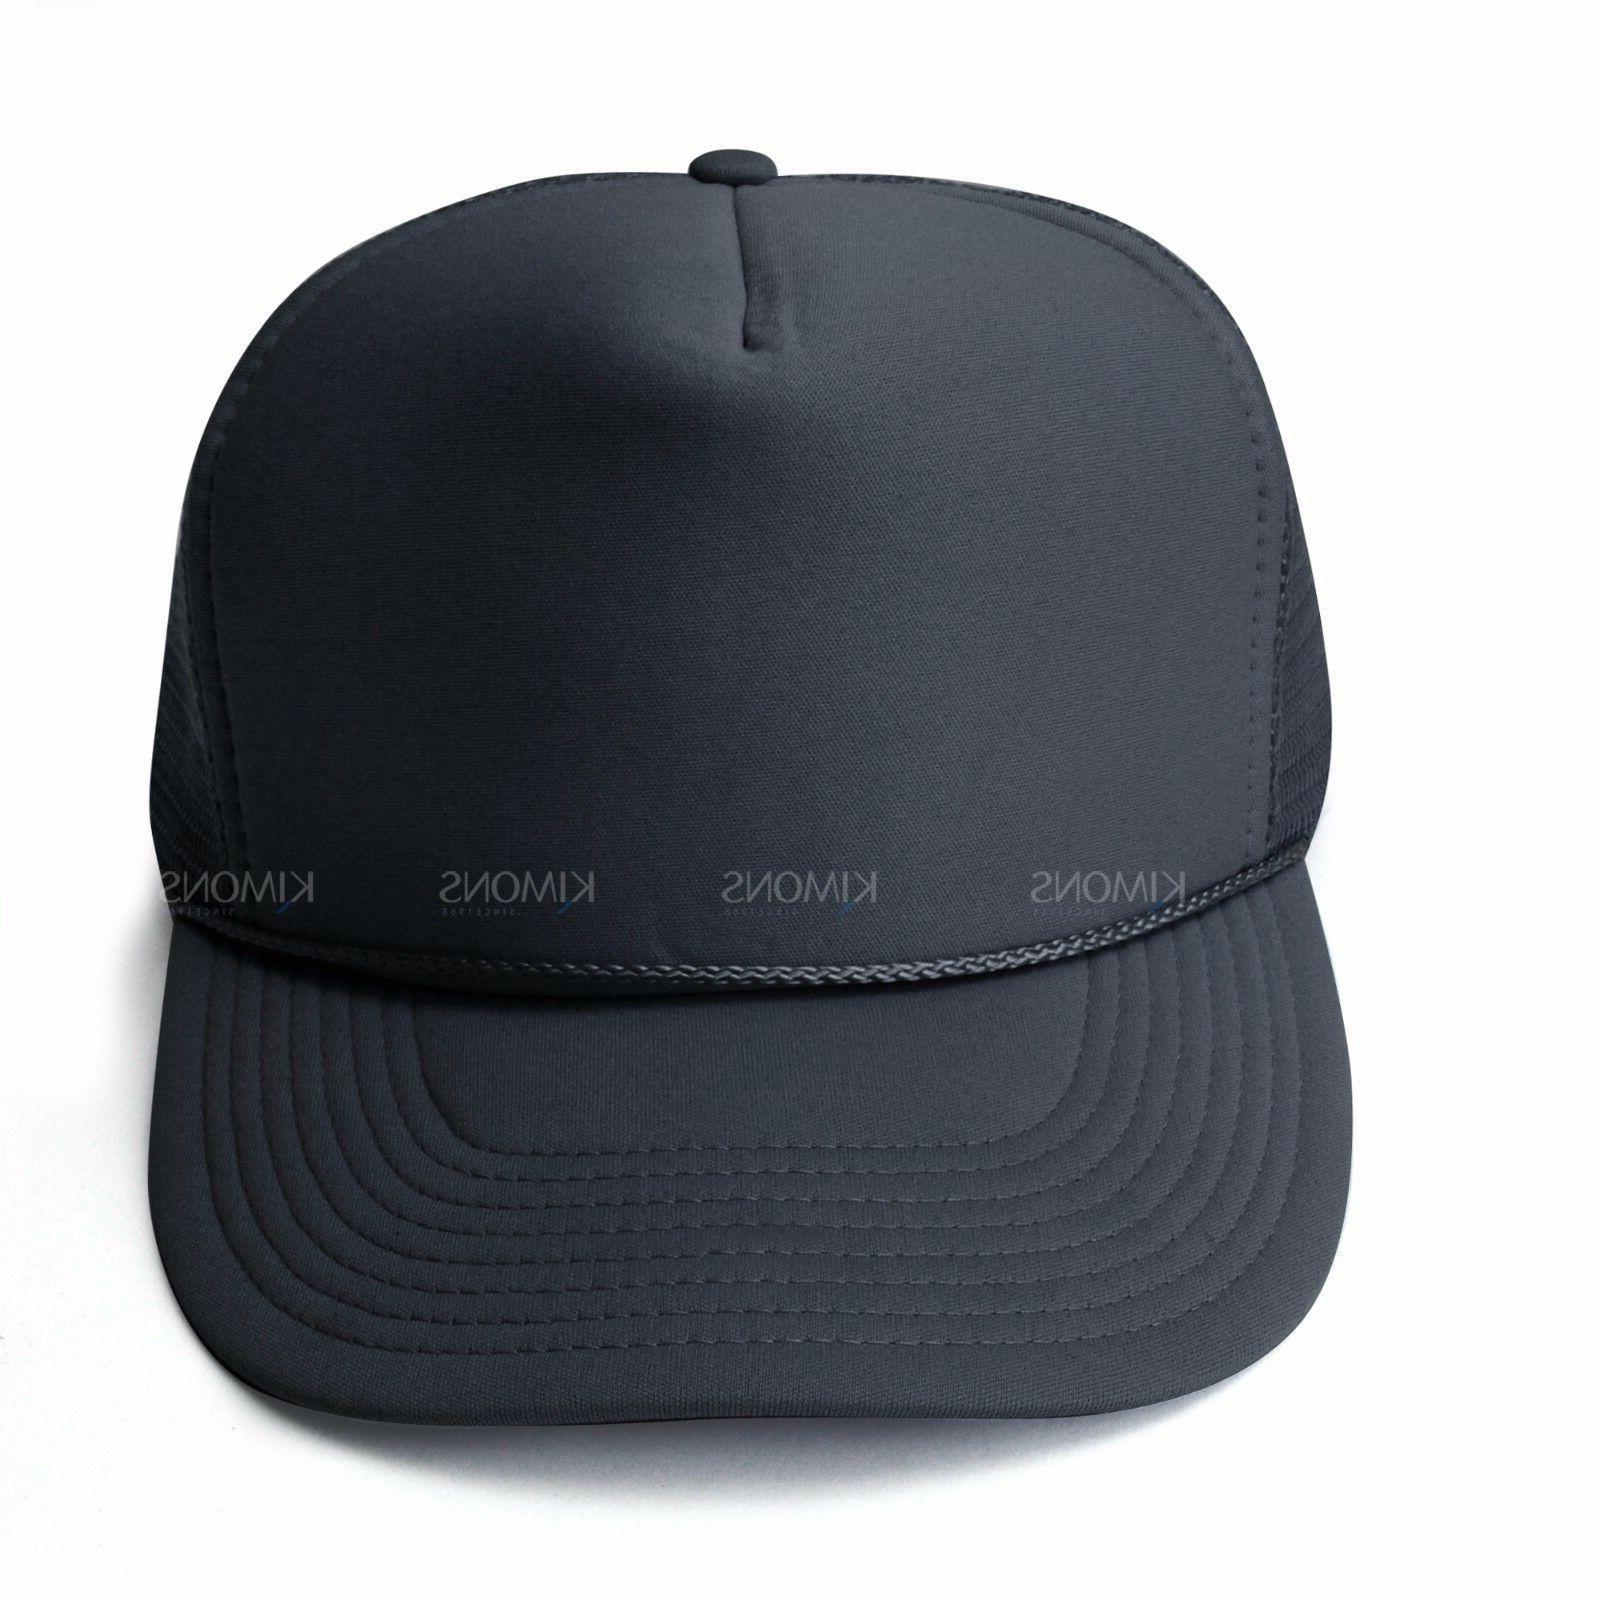 Trucker Hat Baseball Cap Adjustable Solid Hats Flat